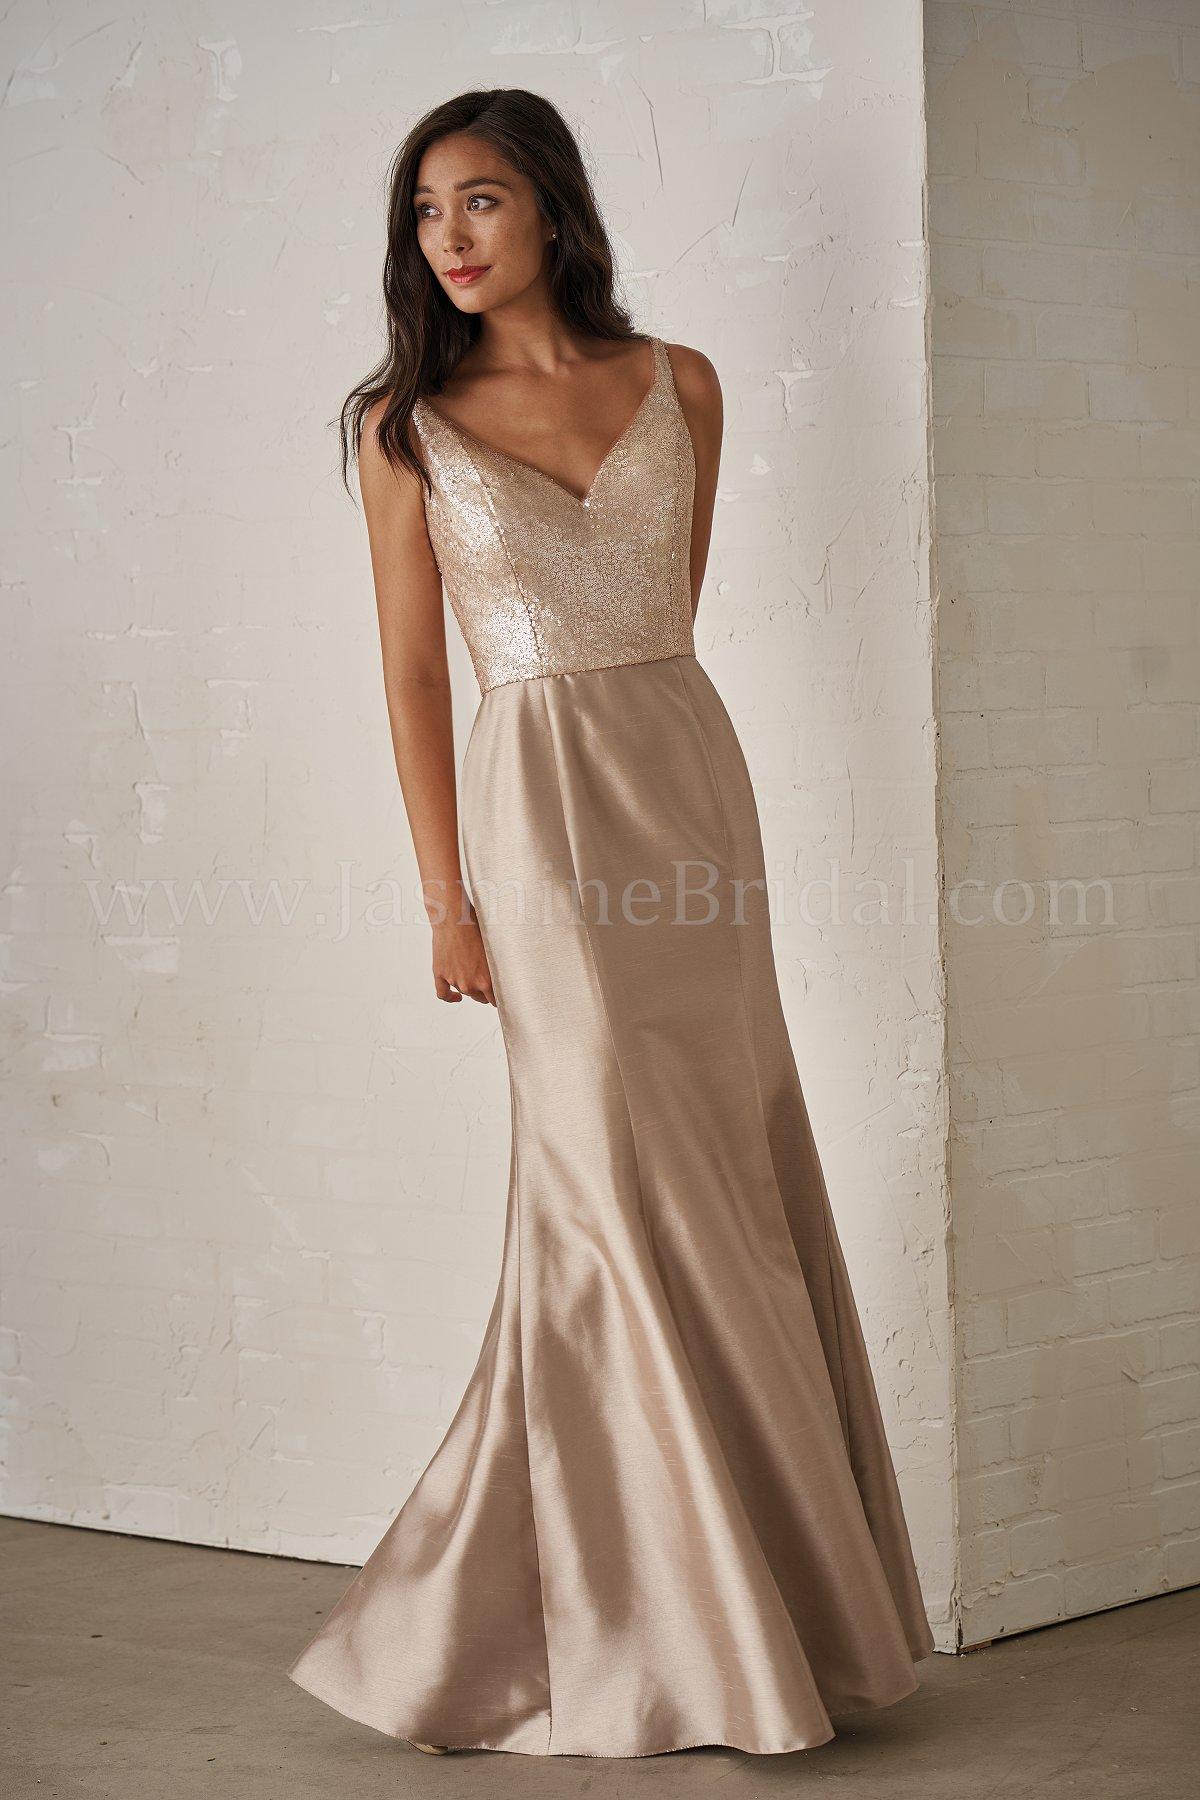 27849447d14 P206011 Long V-neck Sequin   Satin Back Dupioni Bridesmaid Dress